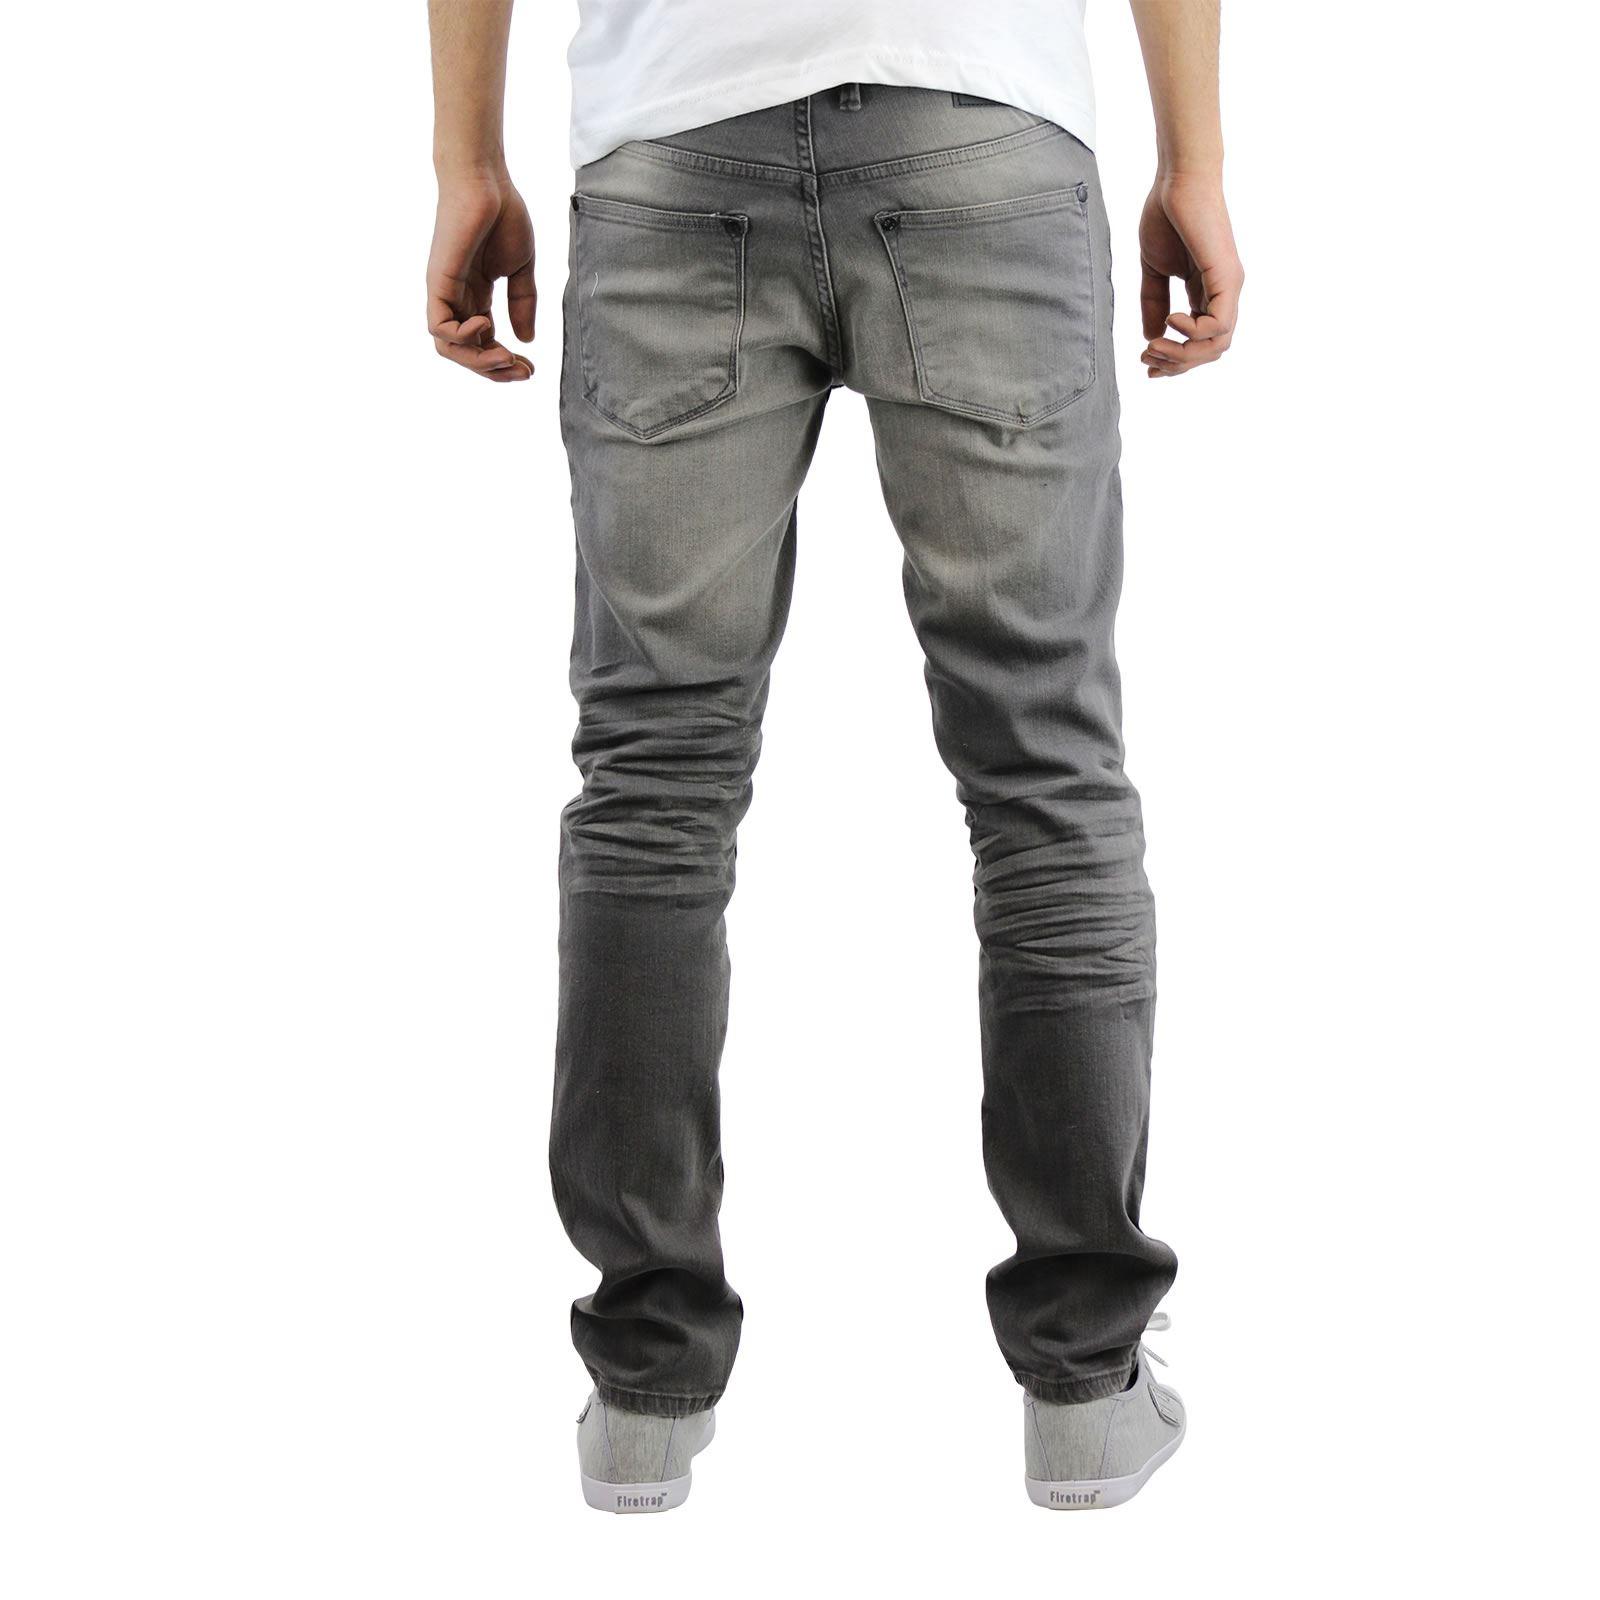 Crosshatch Jaco Mens Jeans Skinny Stretch Distressed Denim Pants